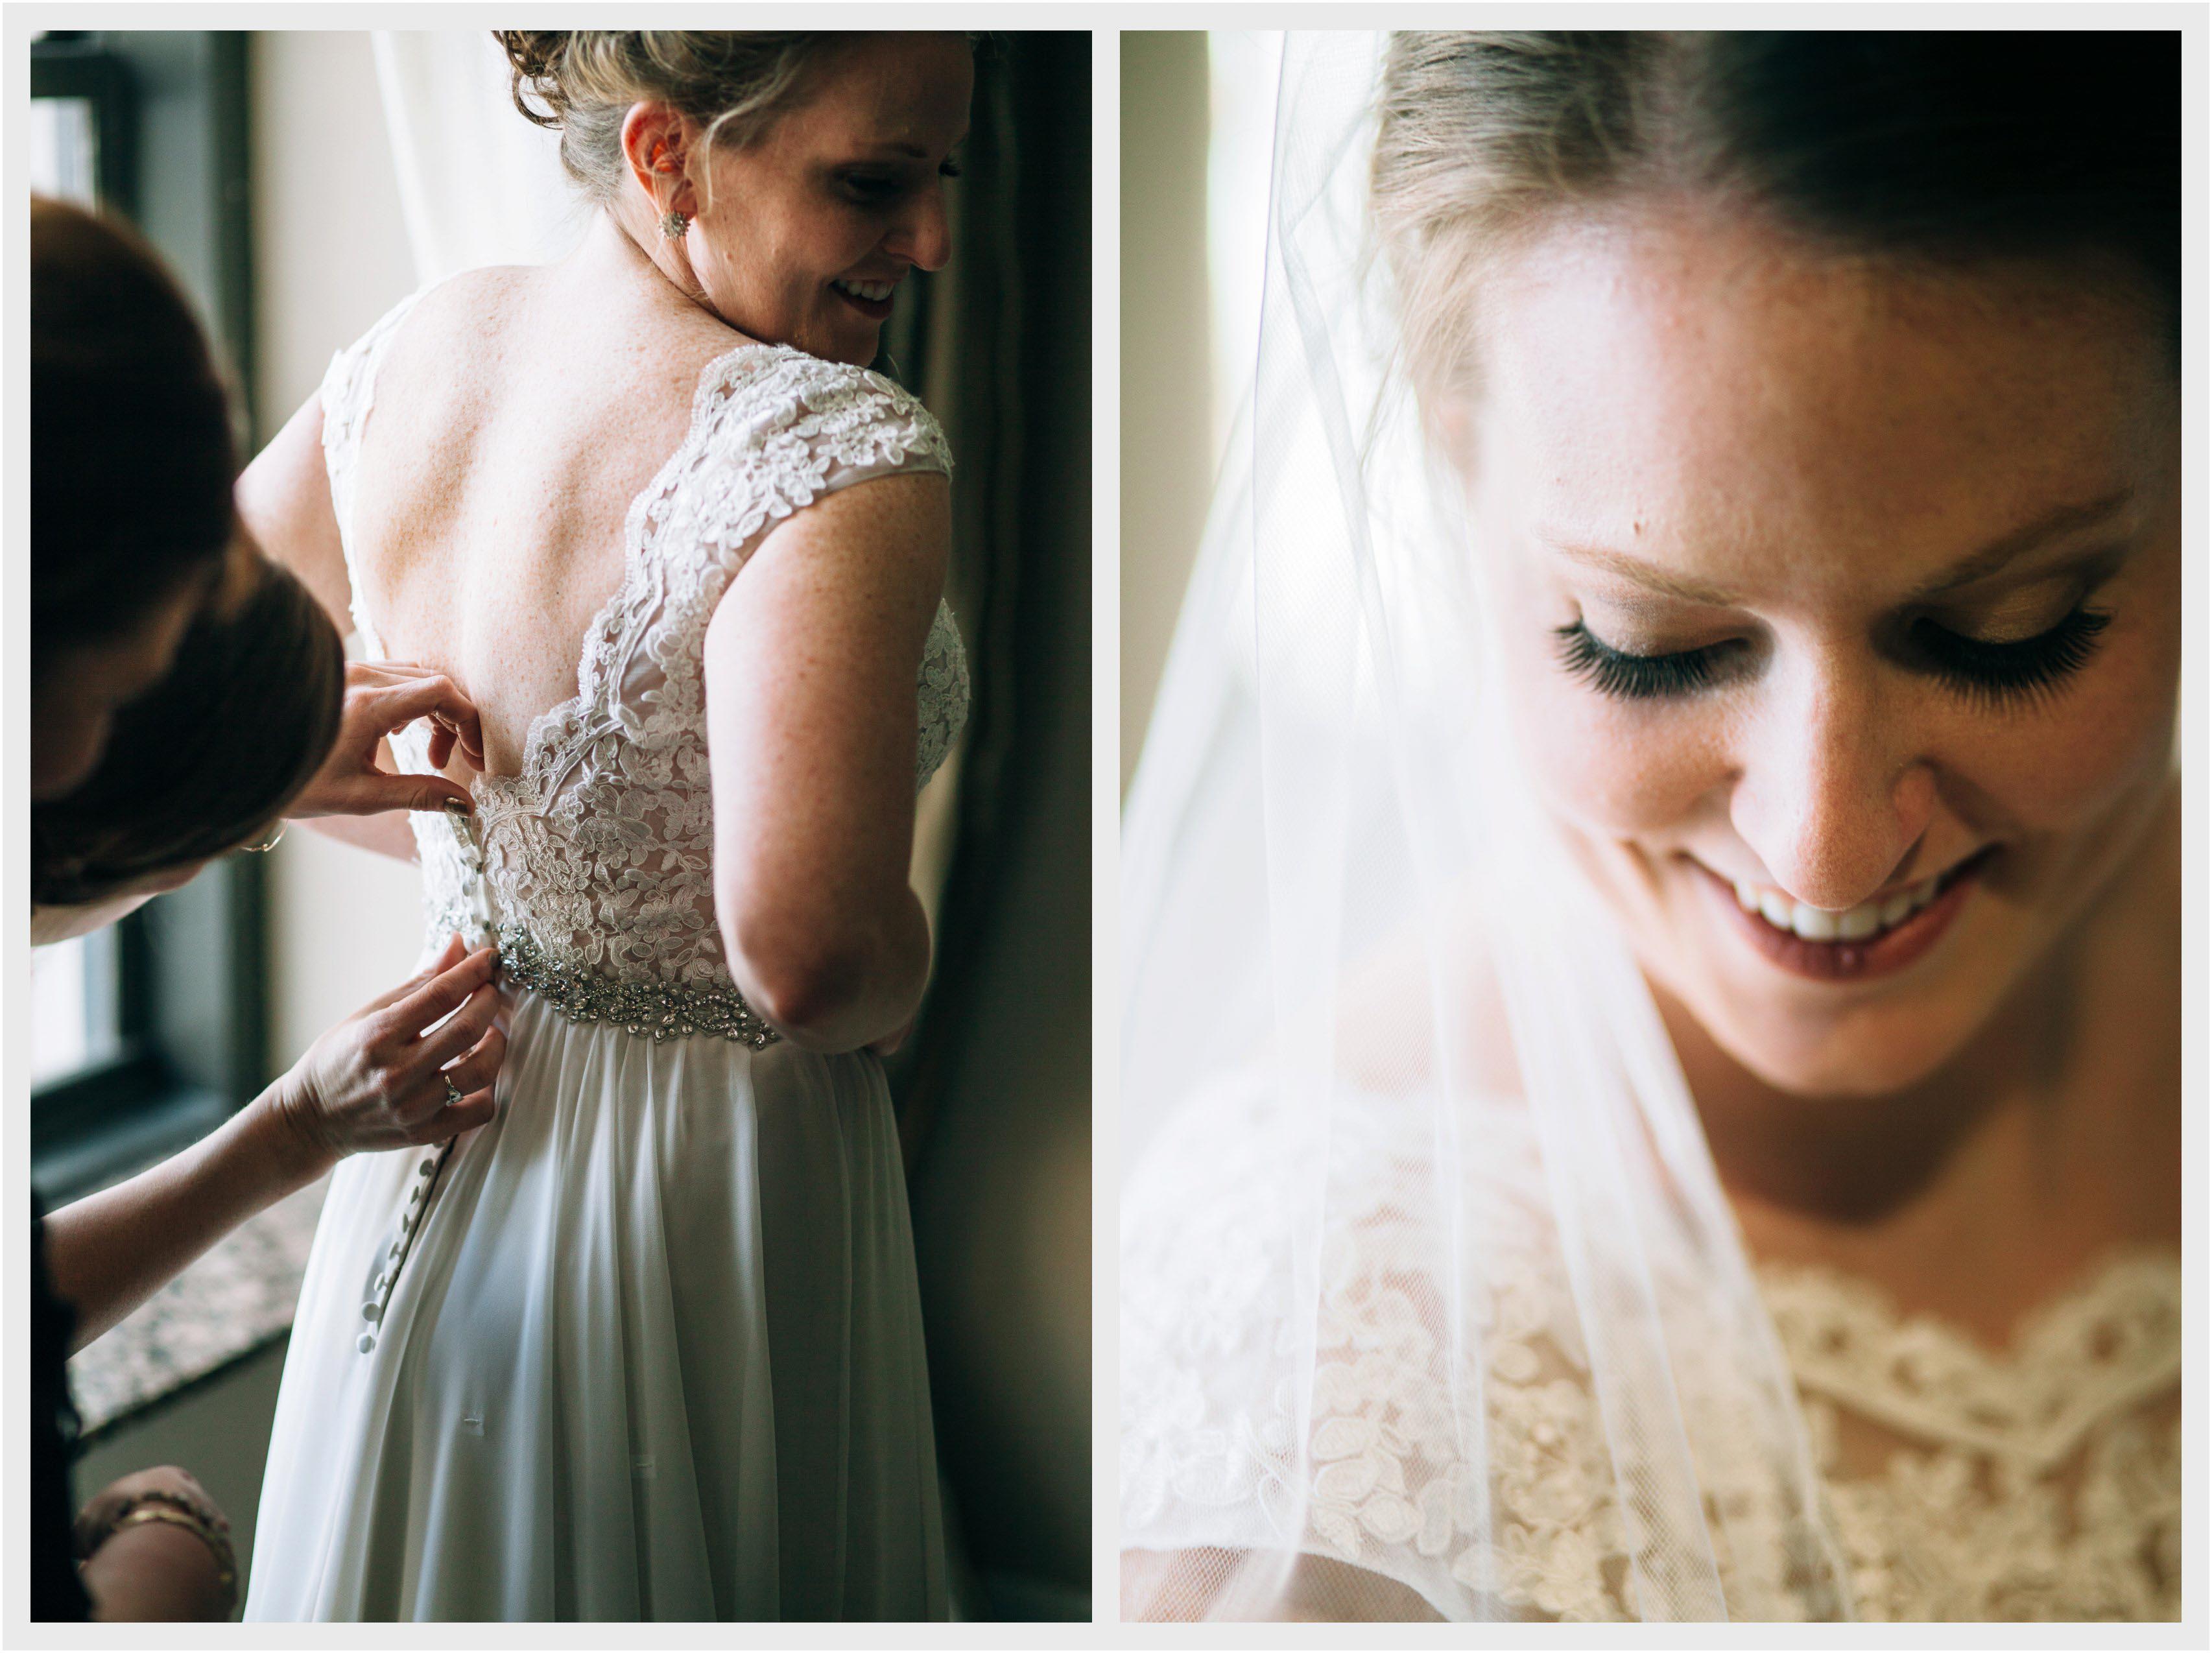 Rhinegeist wedding photos 2